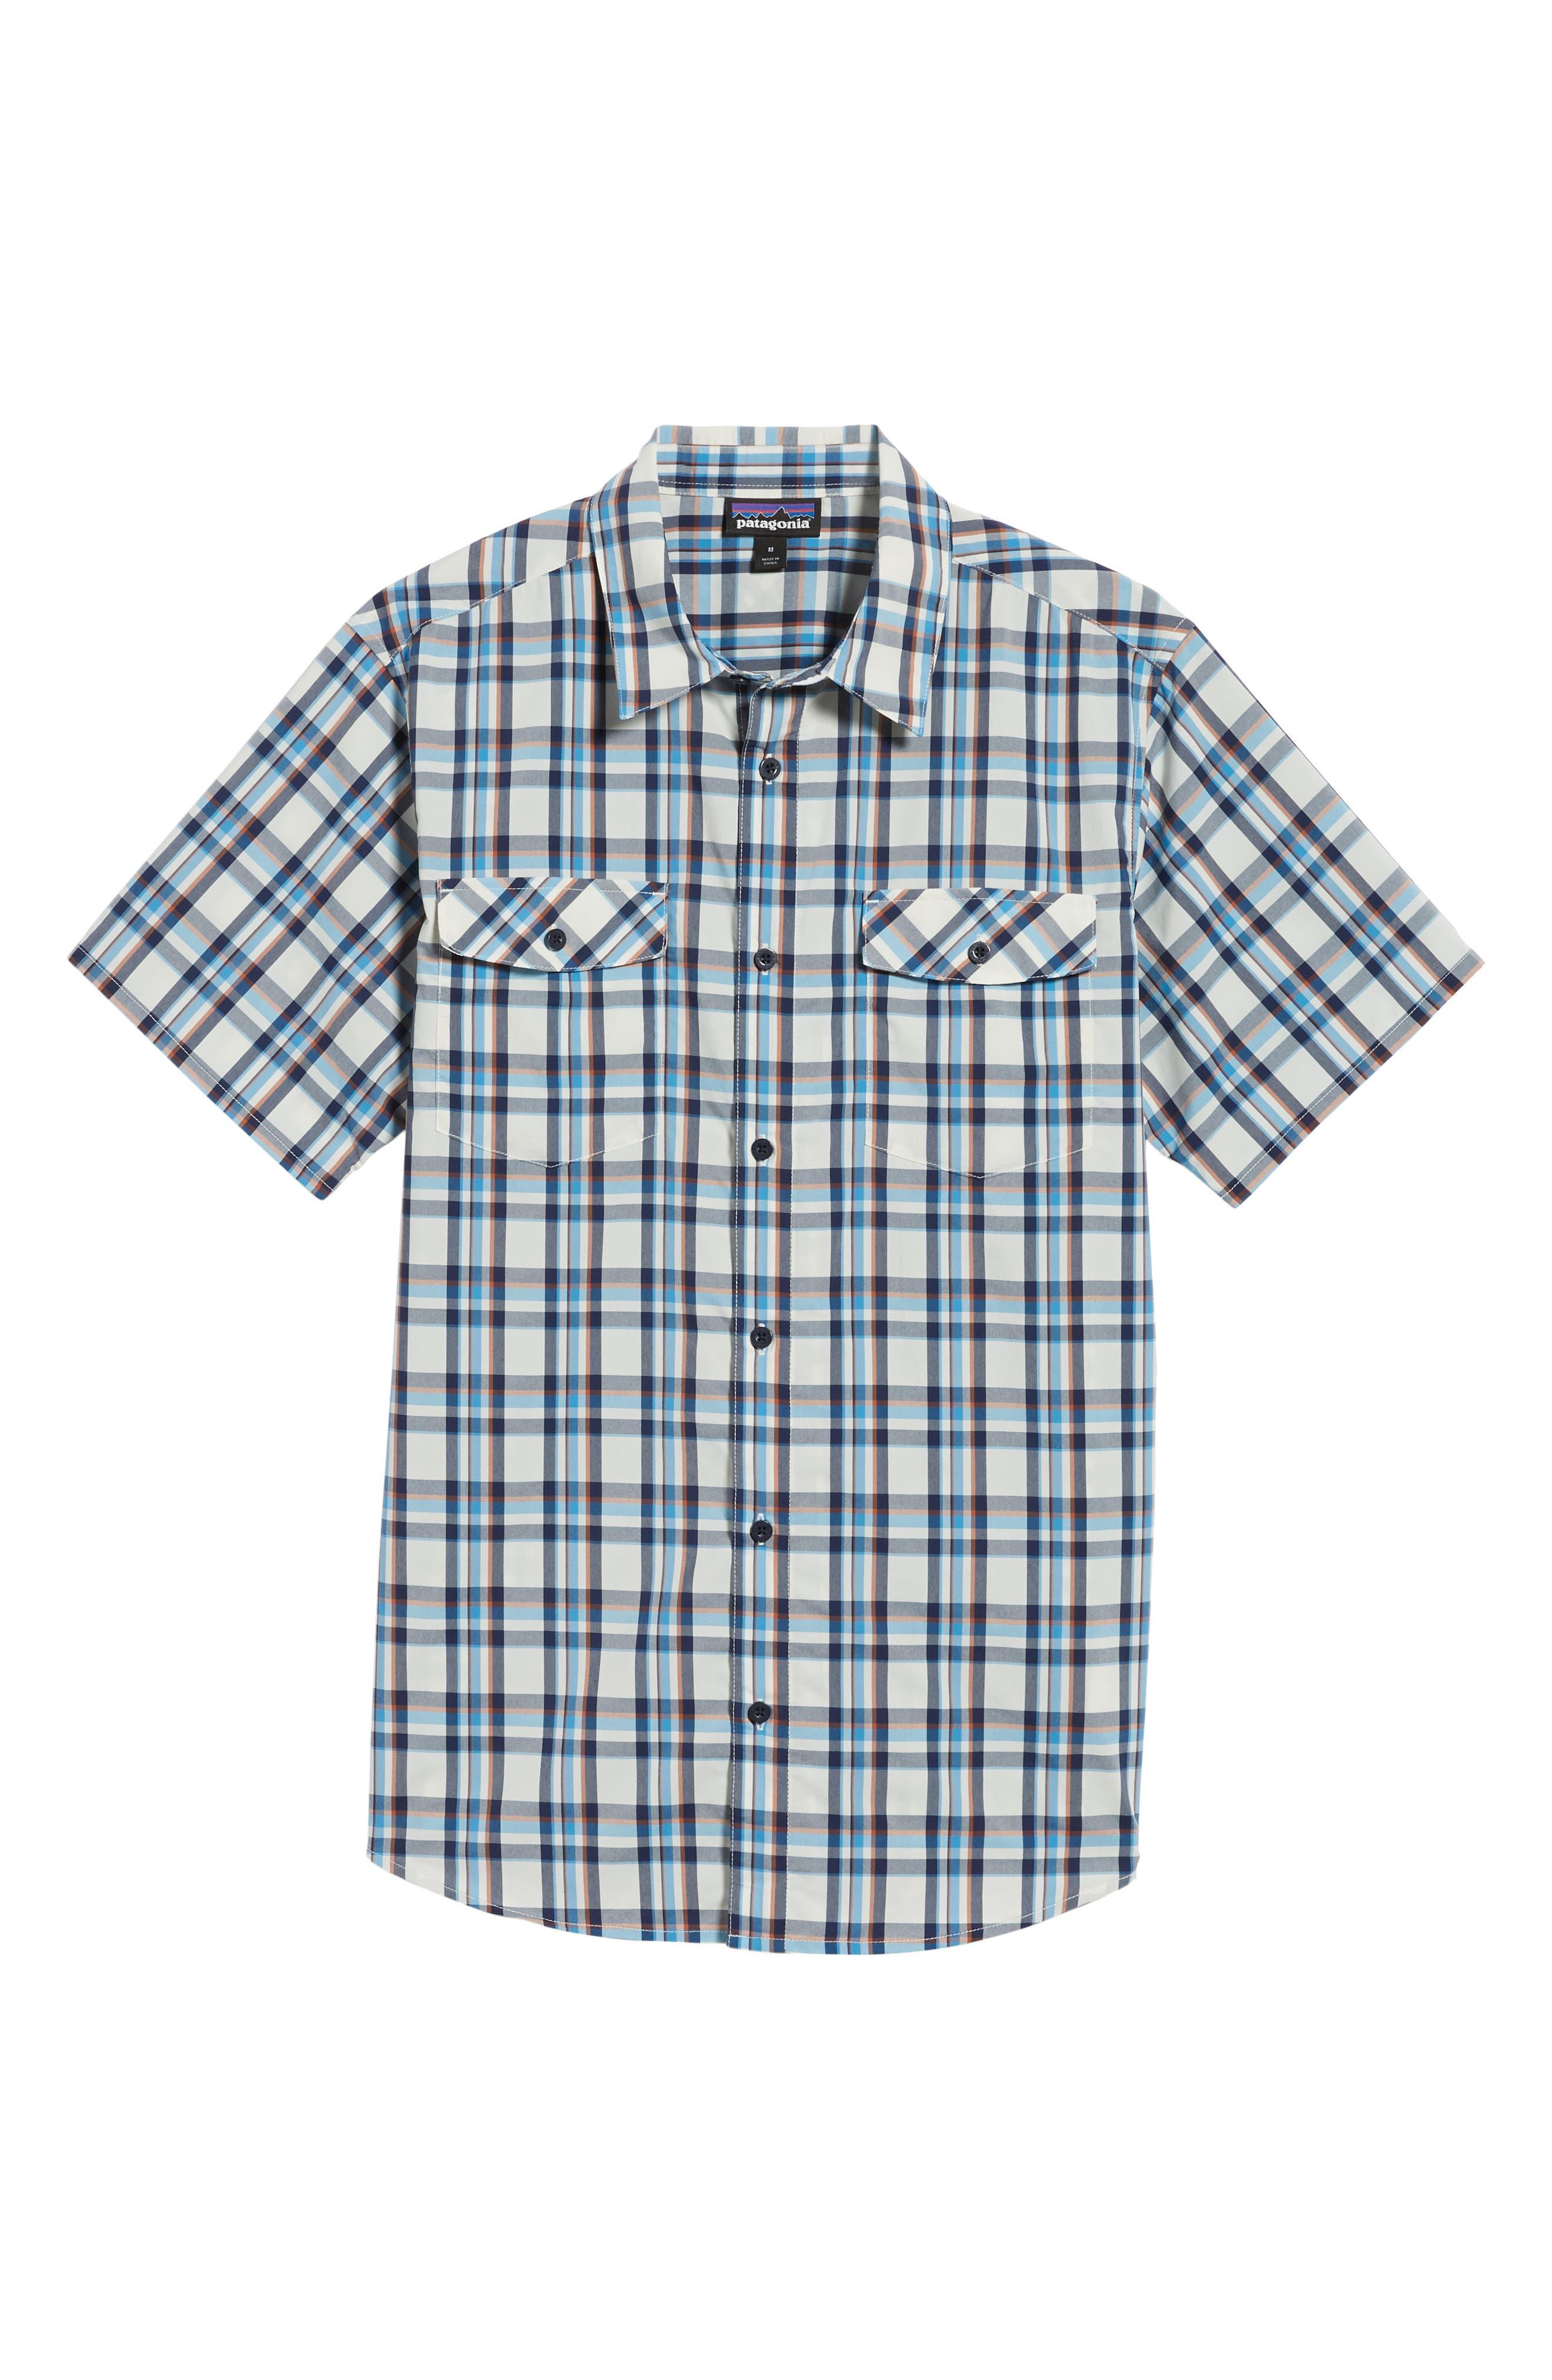 High Moss Regular Fit Short Sleeve Sport Shirt,                             Alternate thumbnail 6, color,                             Anchor/ Birch White